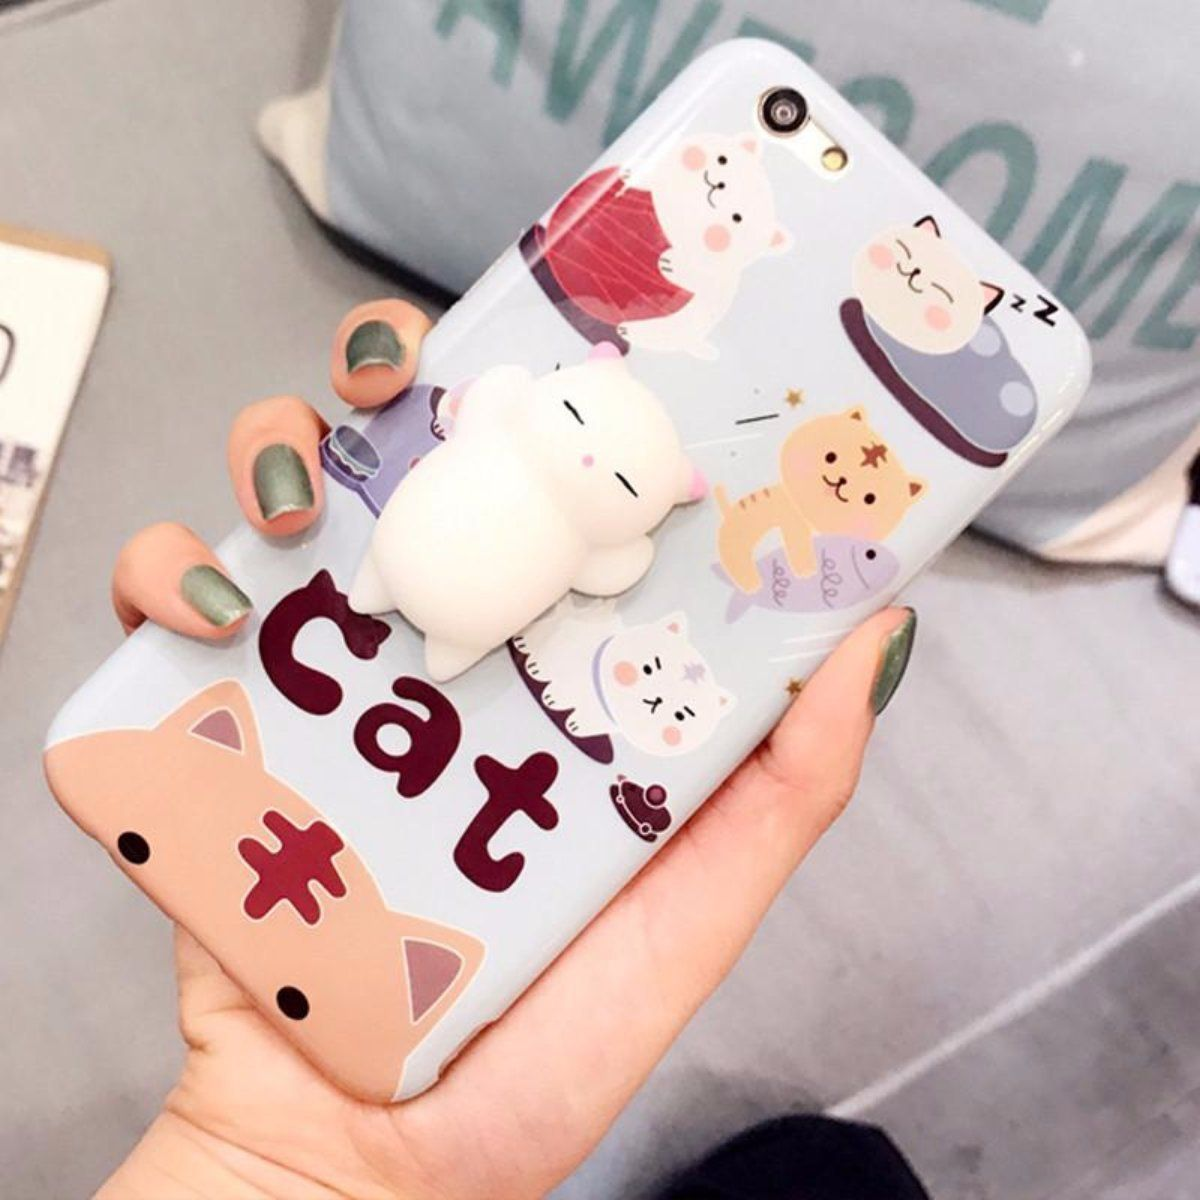 Adorable 3d squishy cat case fun cat phone case cats